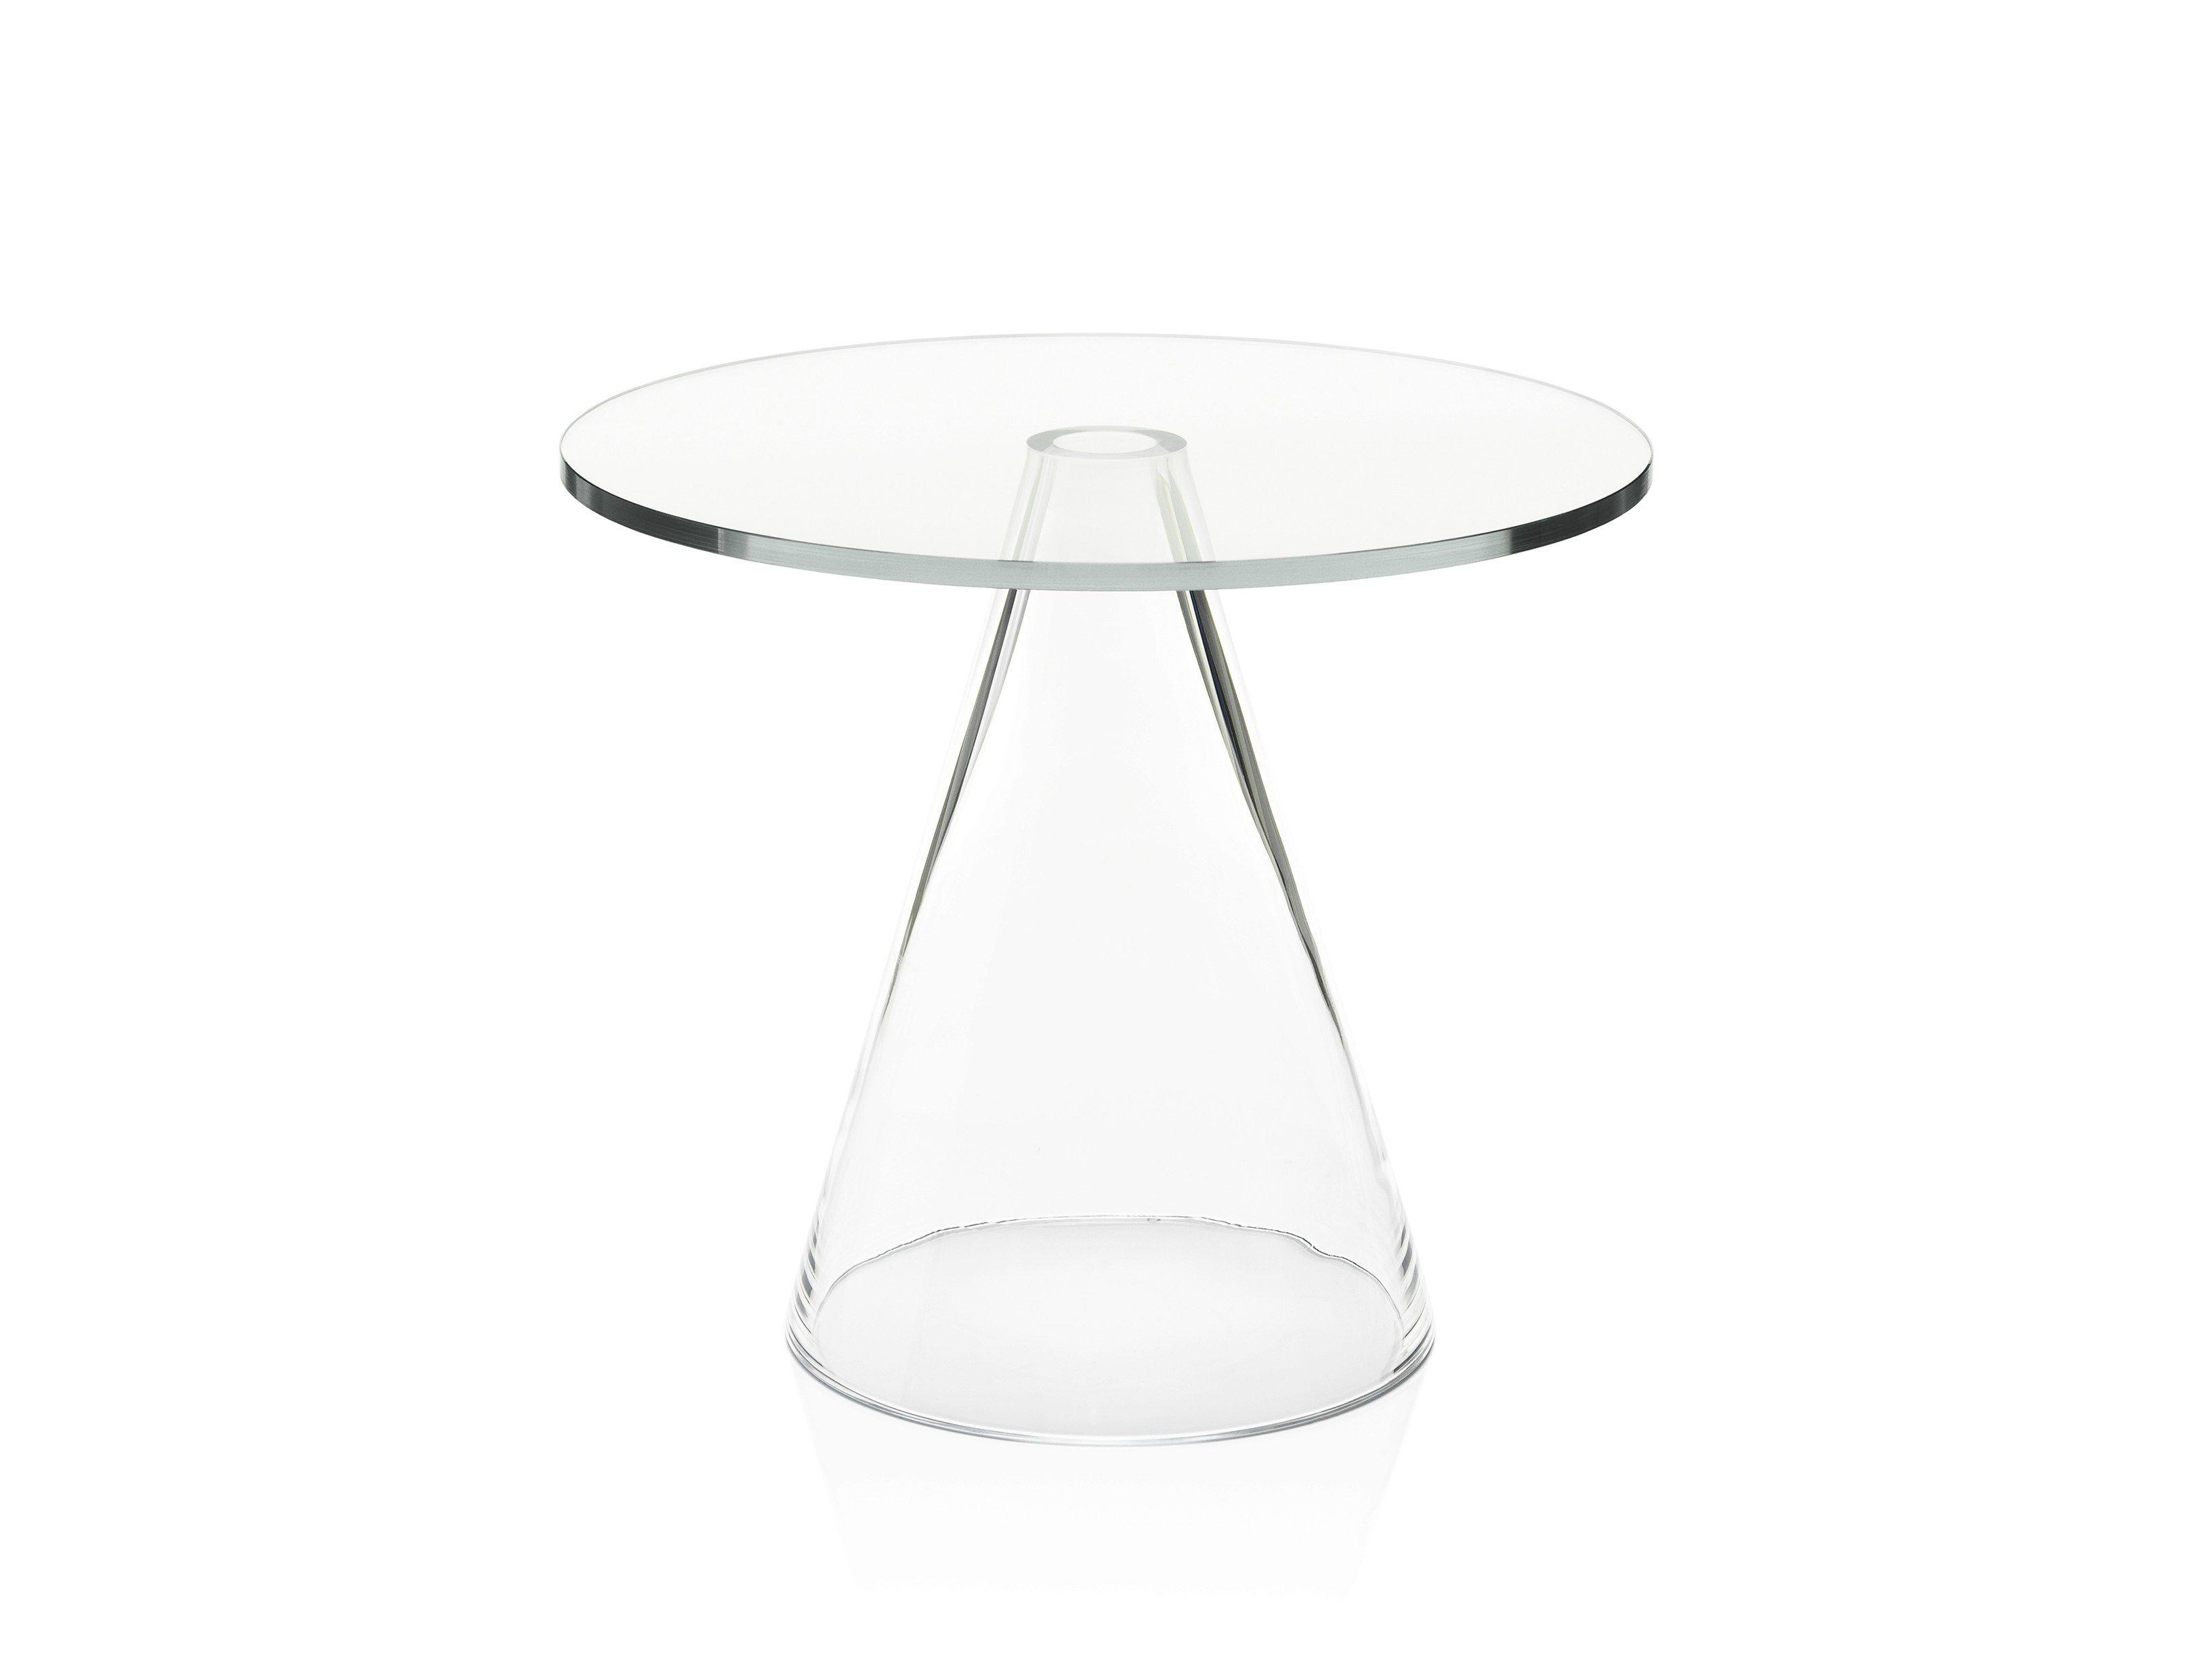 Tavolini ikea emejing tavolini da soggiorno ikea images design trends with tavolini ikea - Ikea tavolini da salotto ...